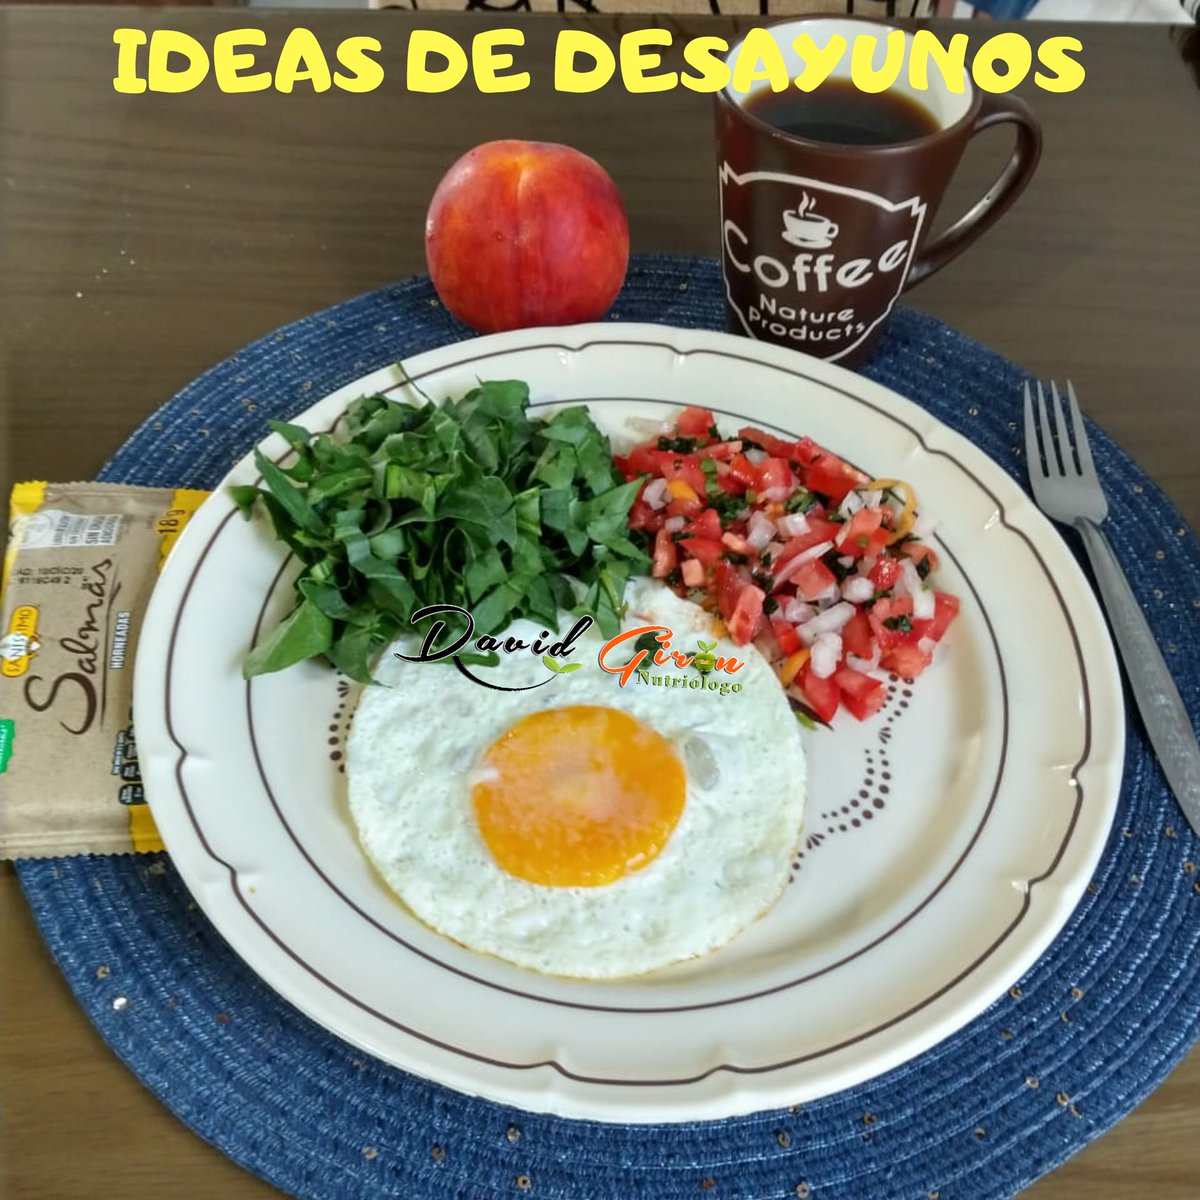 Ideas de desayuno  -Huevito estrellado  (nunca falla) -sandwich de jamón  -platanos rellenos de queso  -calabacitas rellenas de atún